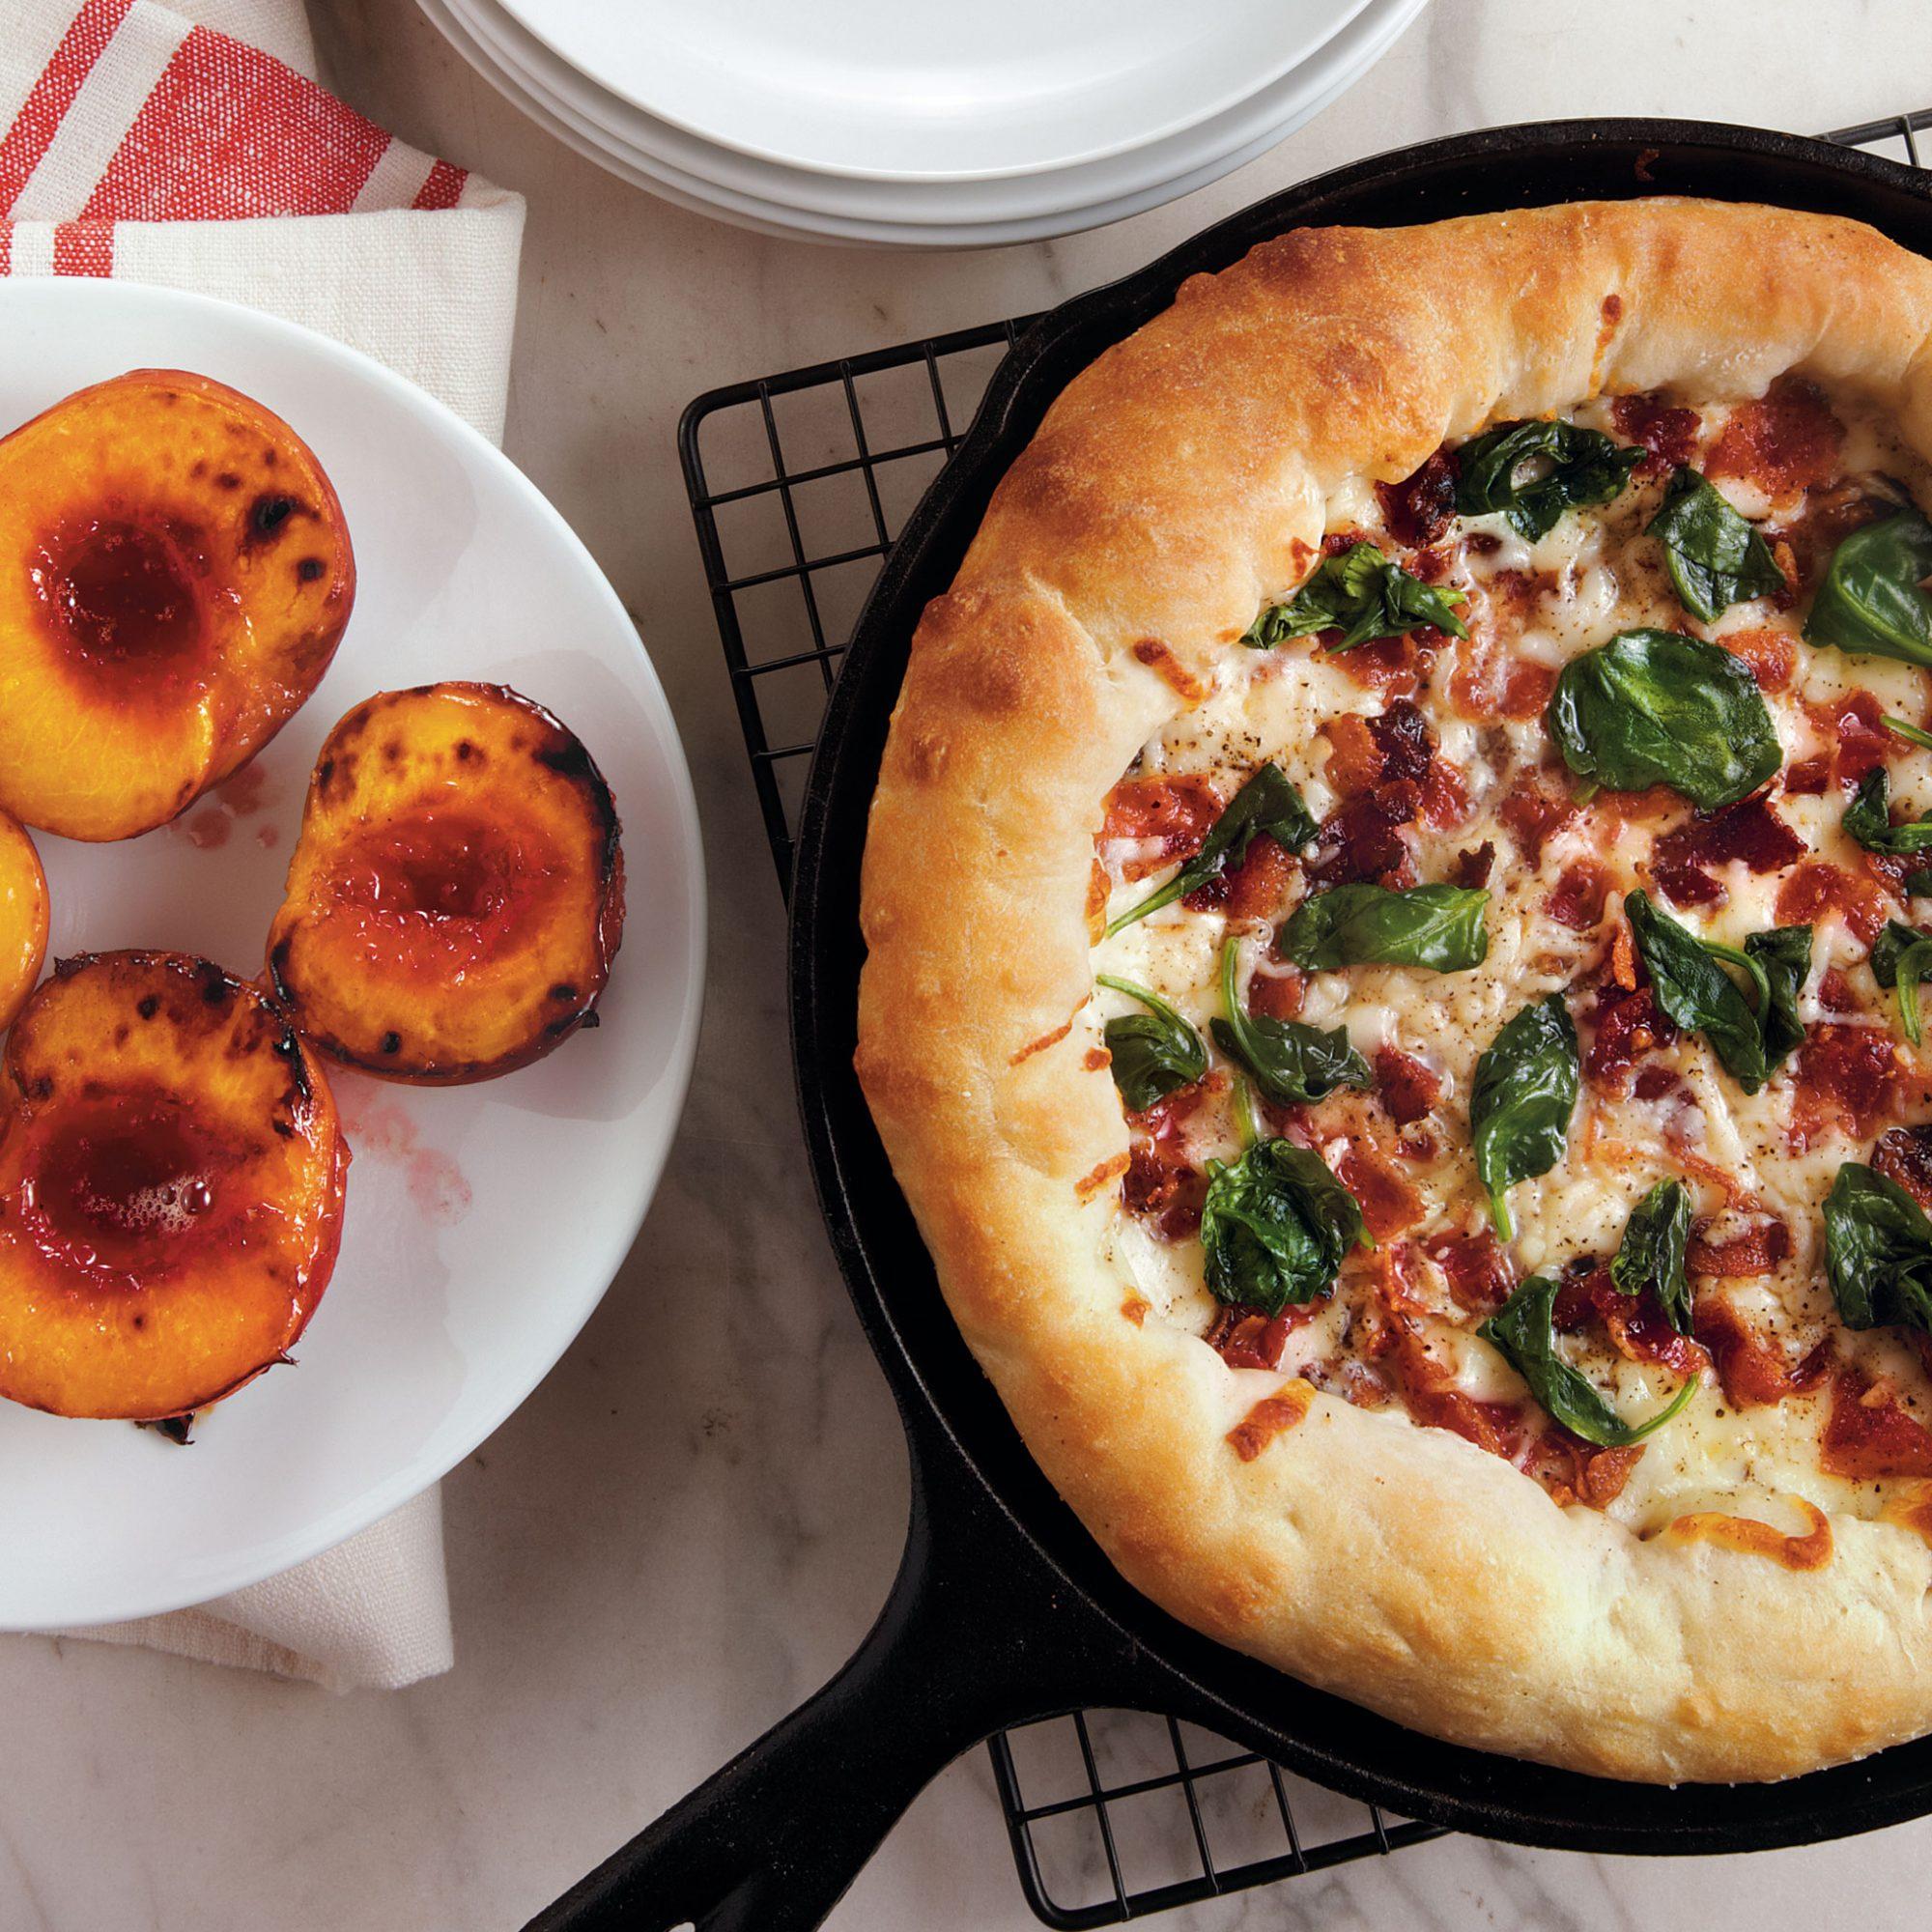 ck-Cast-Iron Breakfast Pizza Image